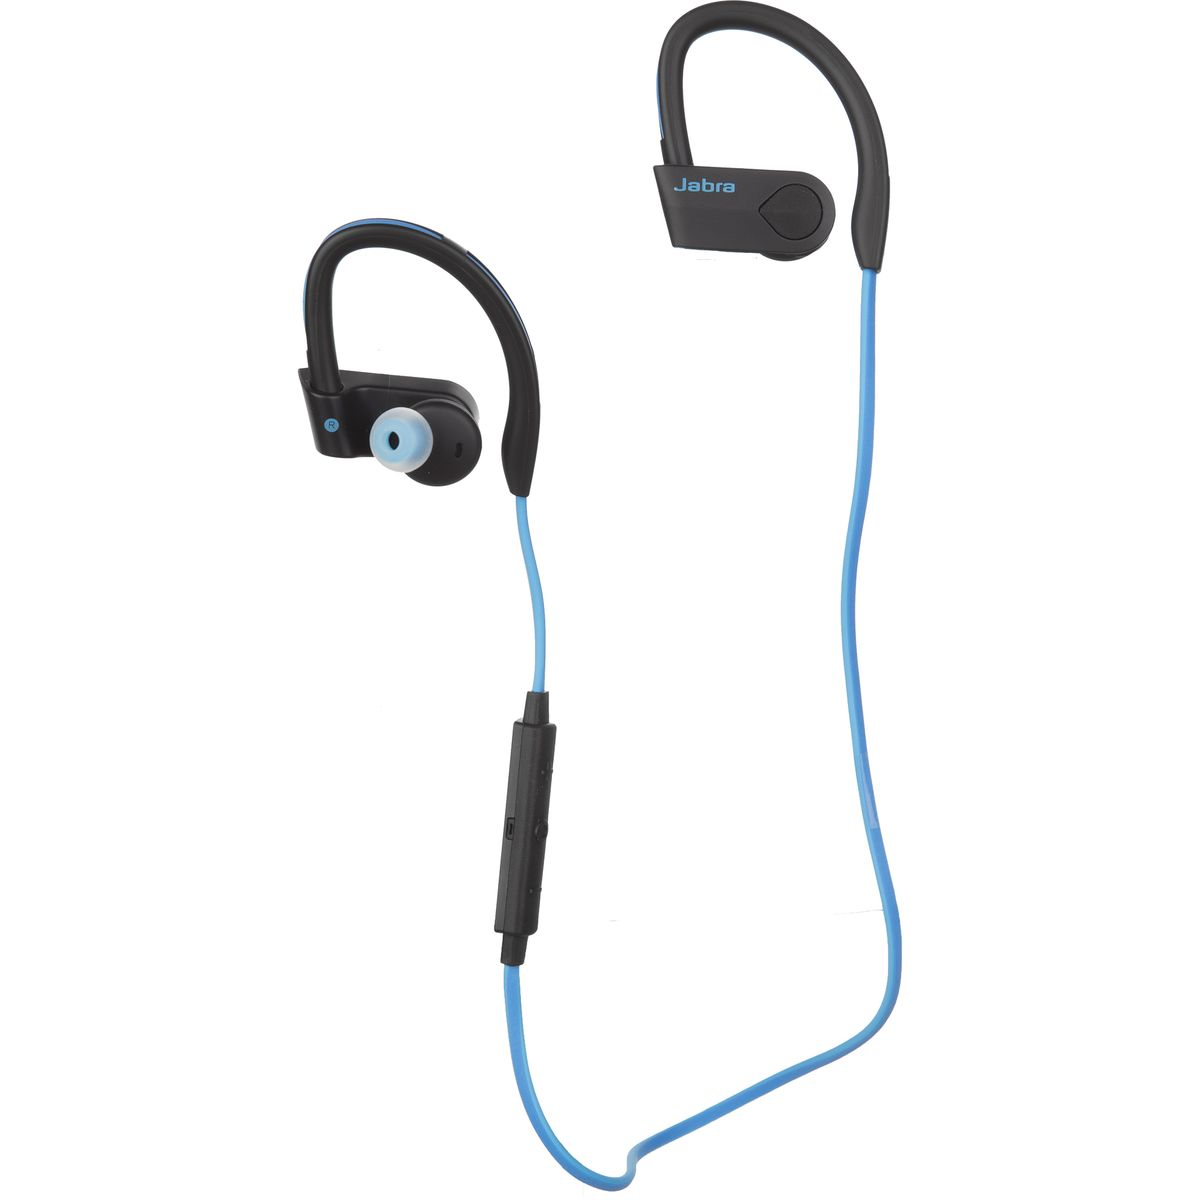 Jabra Sport Pace Wireless Headphones: Jabra Sport Pace Wireless Headphones